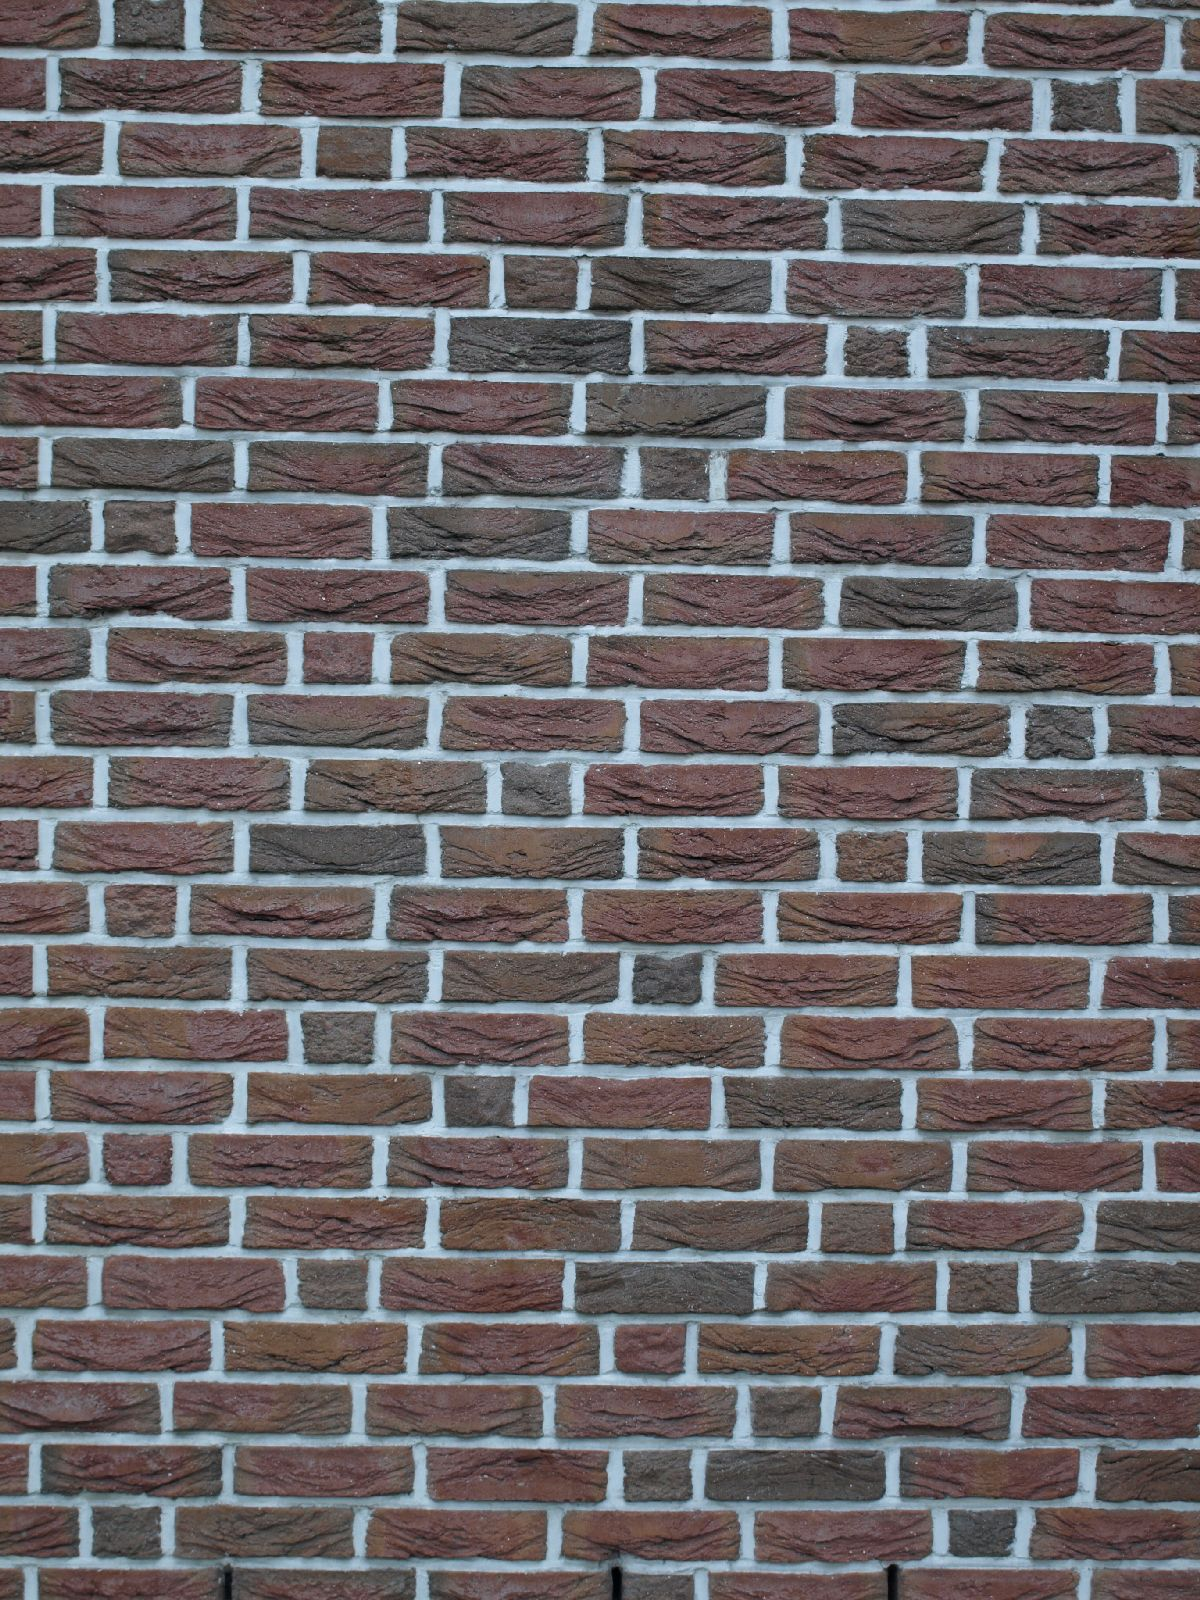 Wand-Mauerwerk-Backstein_Textur_A_PC258289